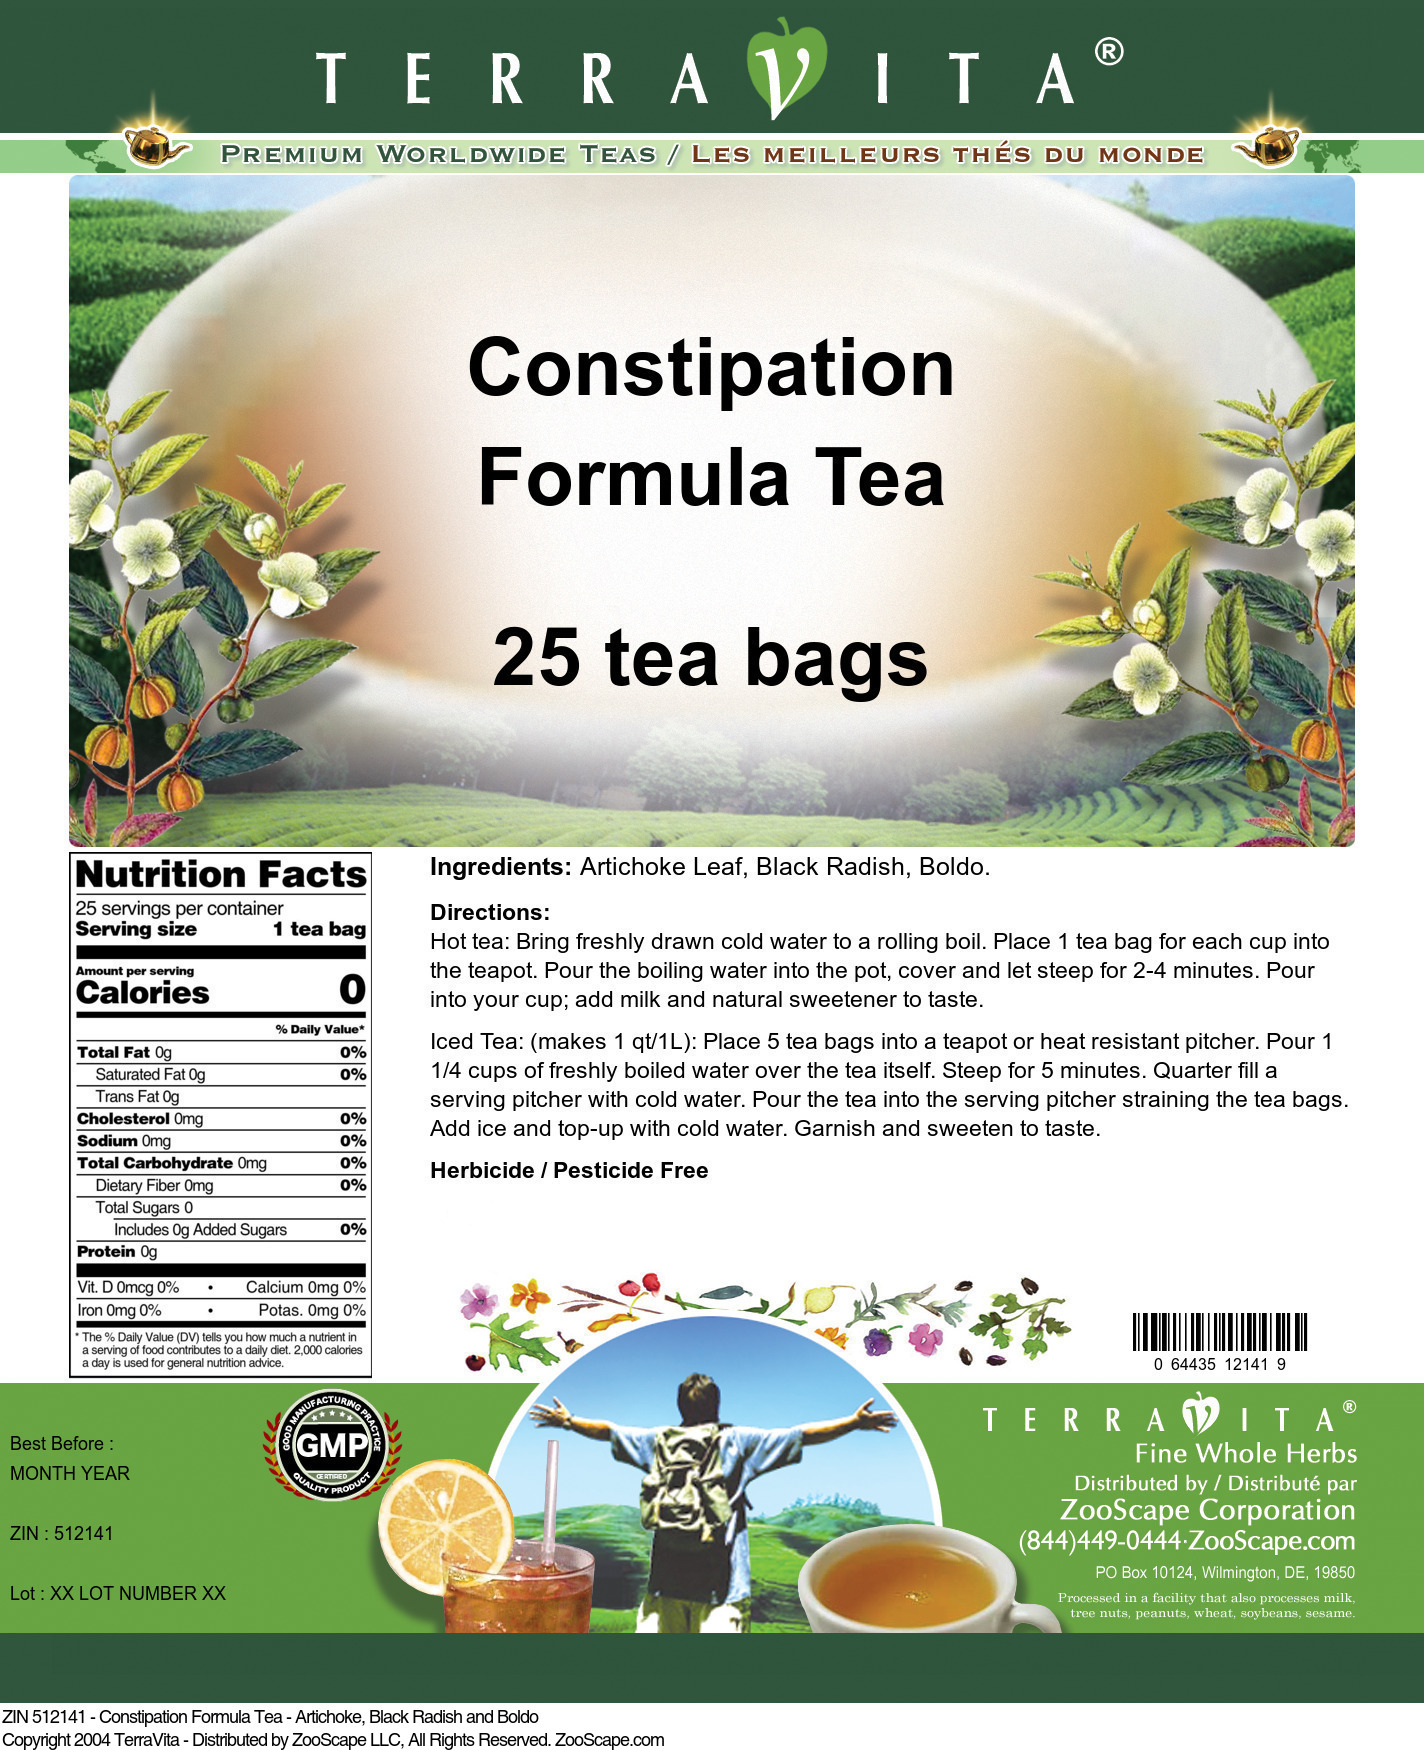 Constipation Formula Tea - Artichoke, Black Radish and Boldo